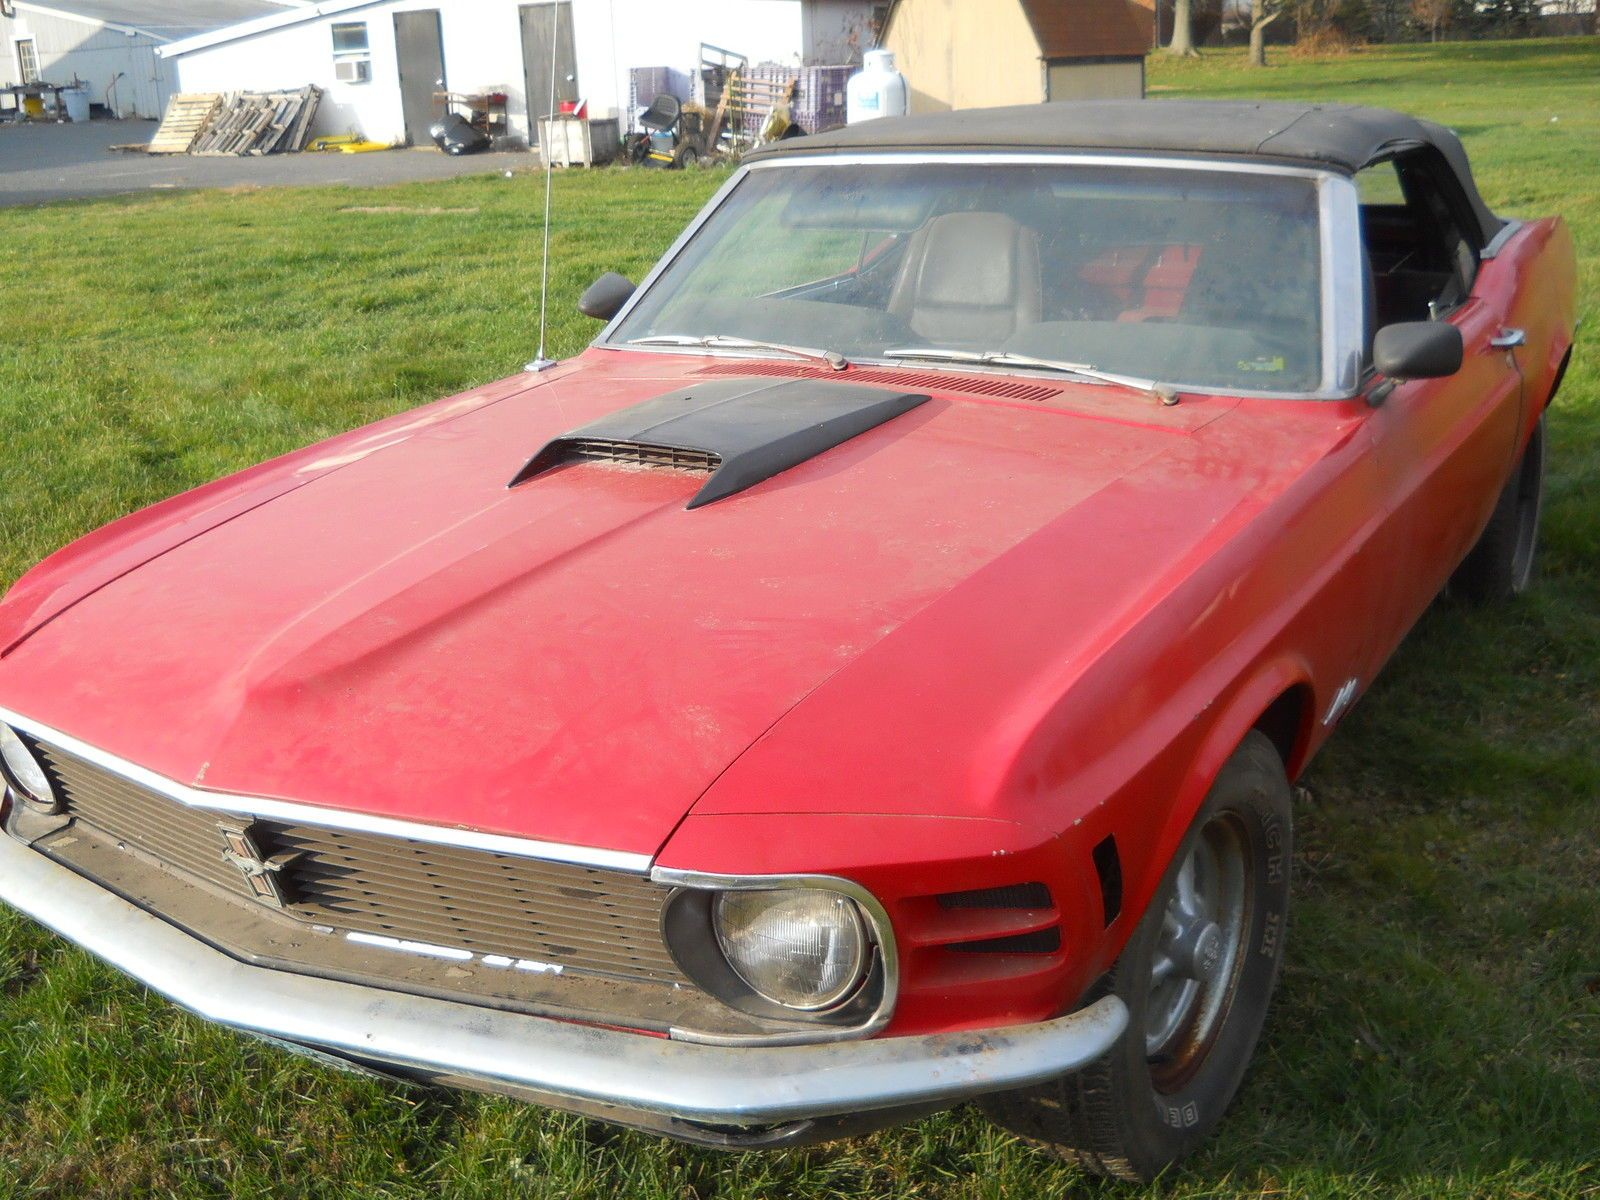 1970 FORD Mustang Original 302 V8 Convertible Restoration Project ...